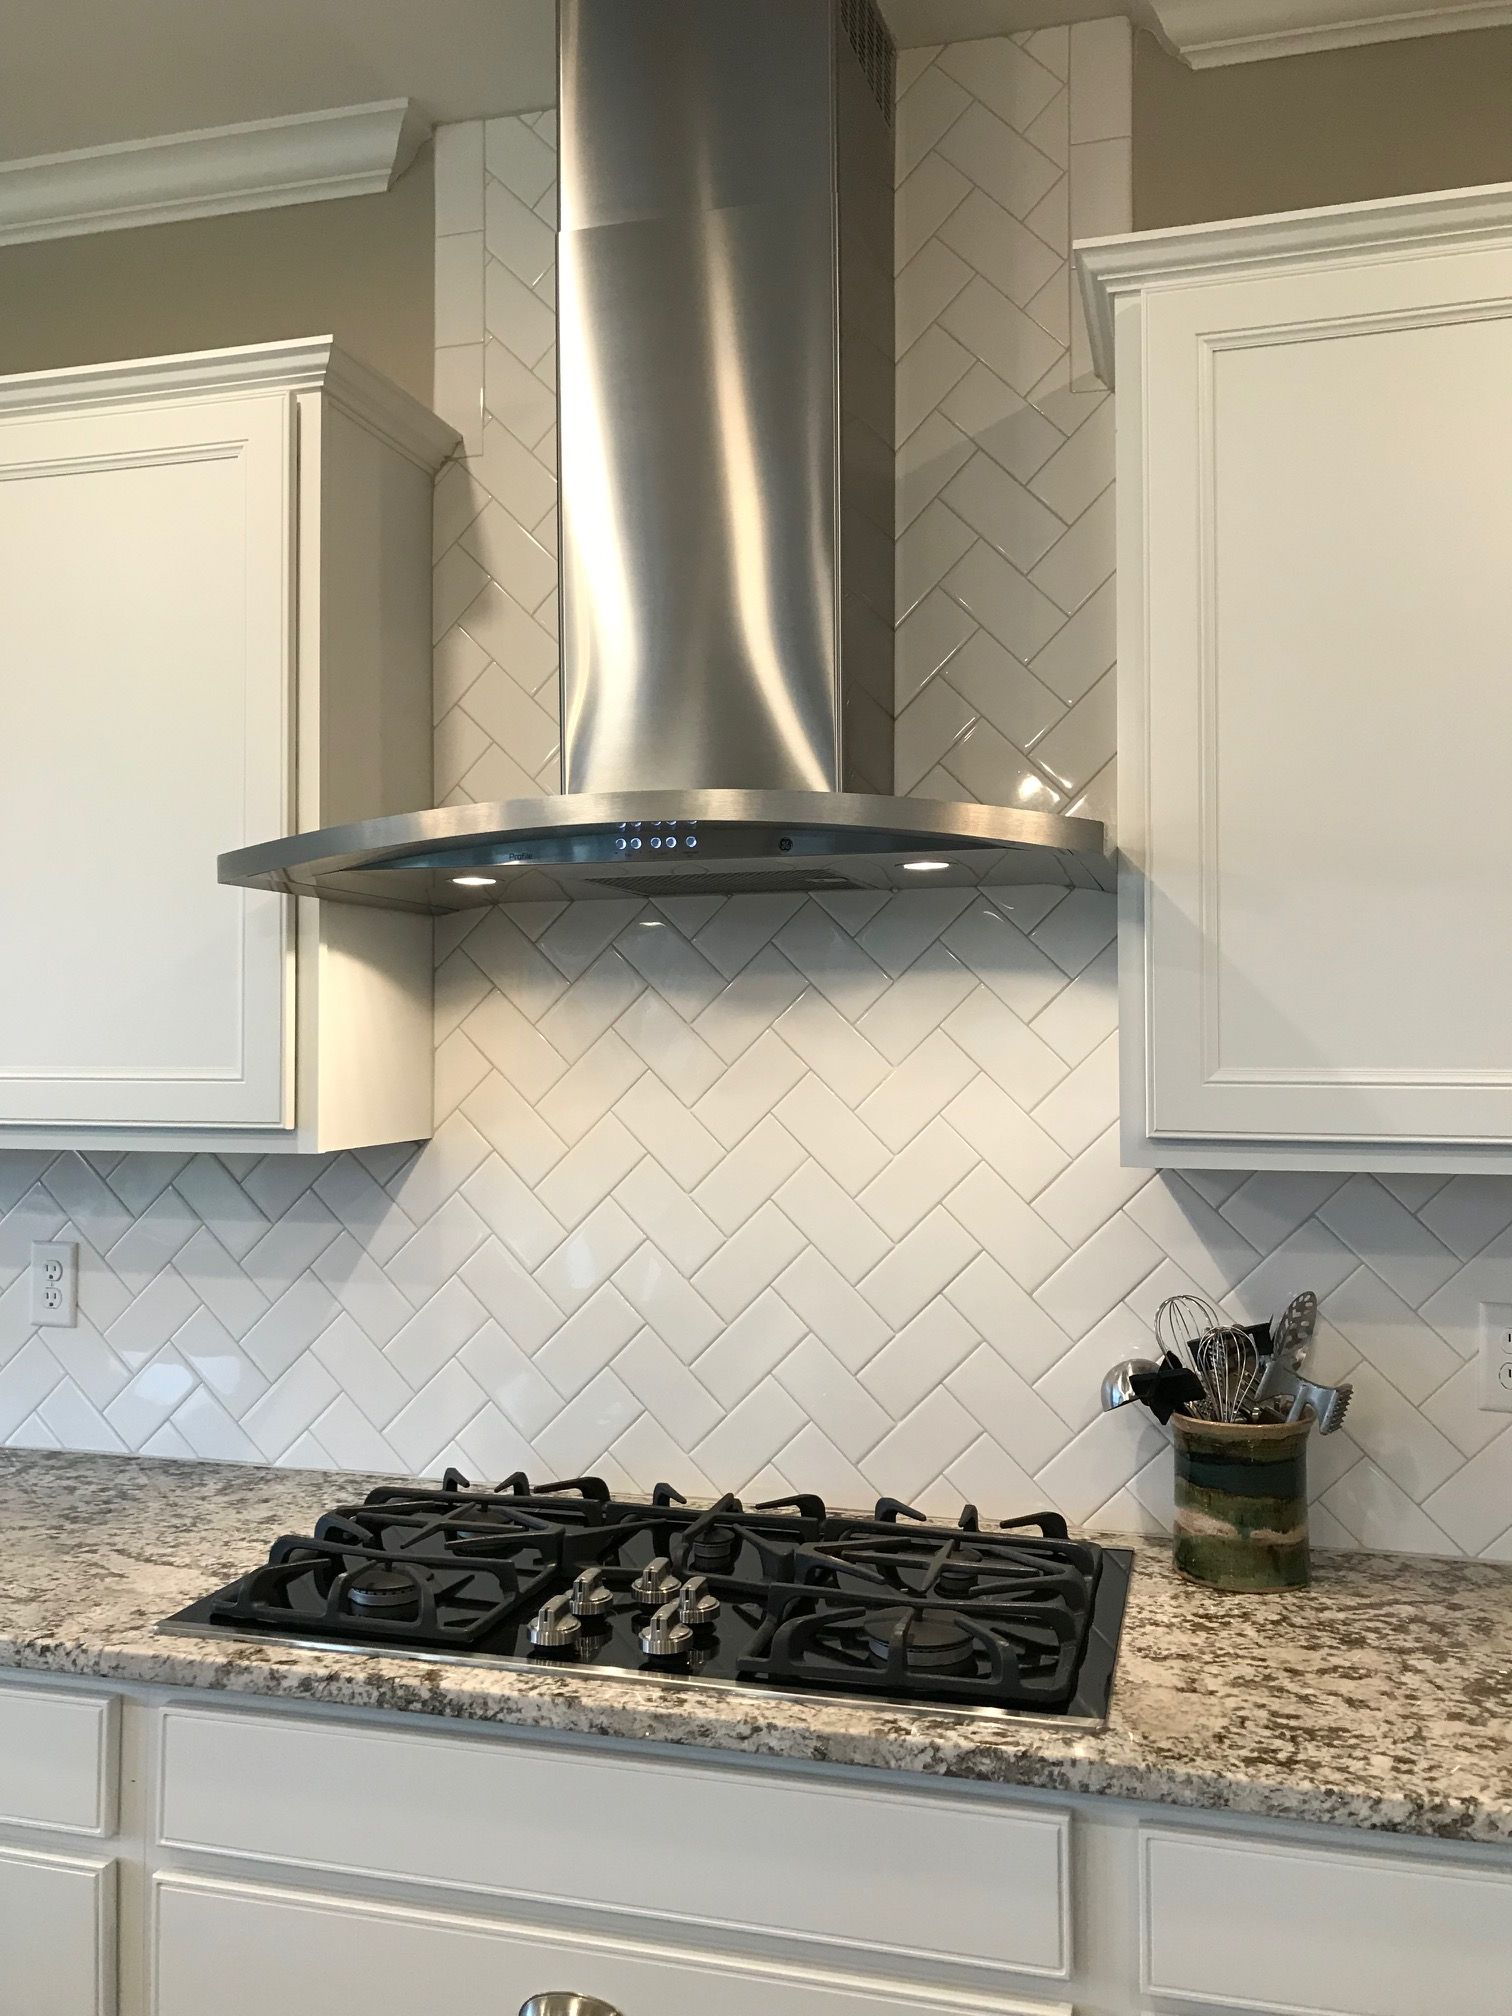 Arctic White 3x6 Gloss Tile In Herringbone Pattern Southwest House Herringbone Backsplash Kitchen Remodel